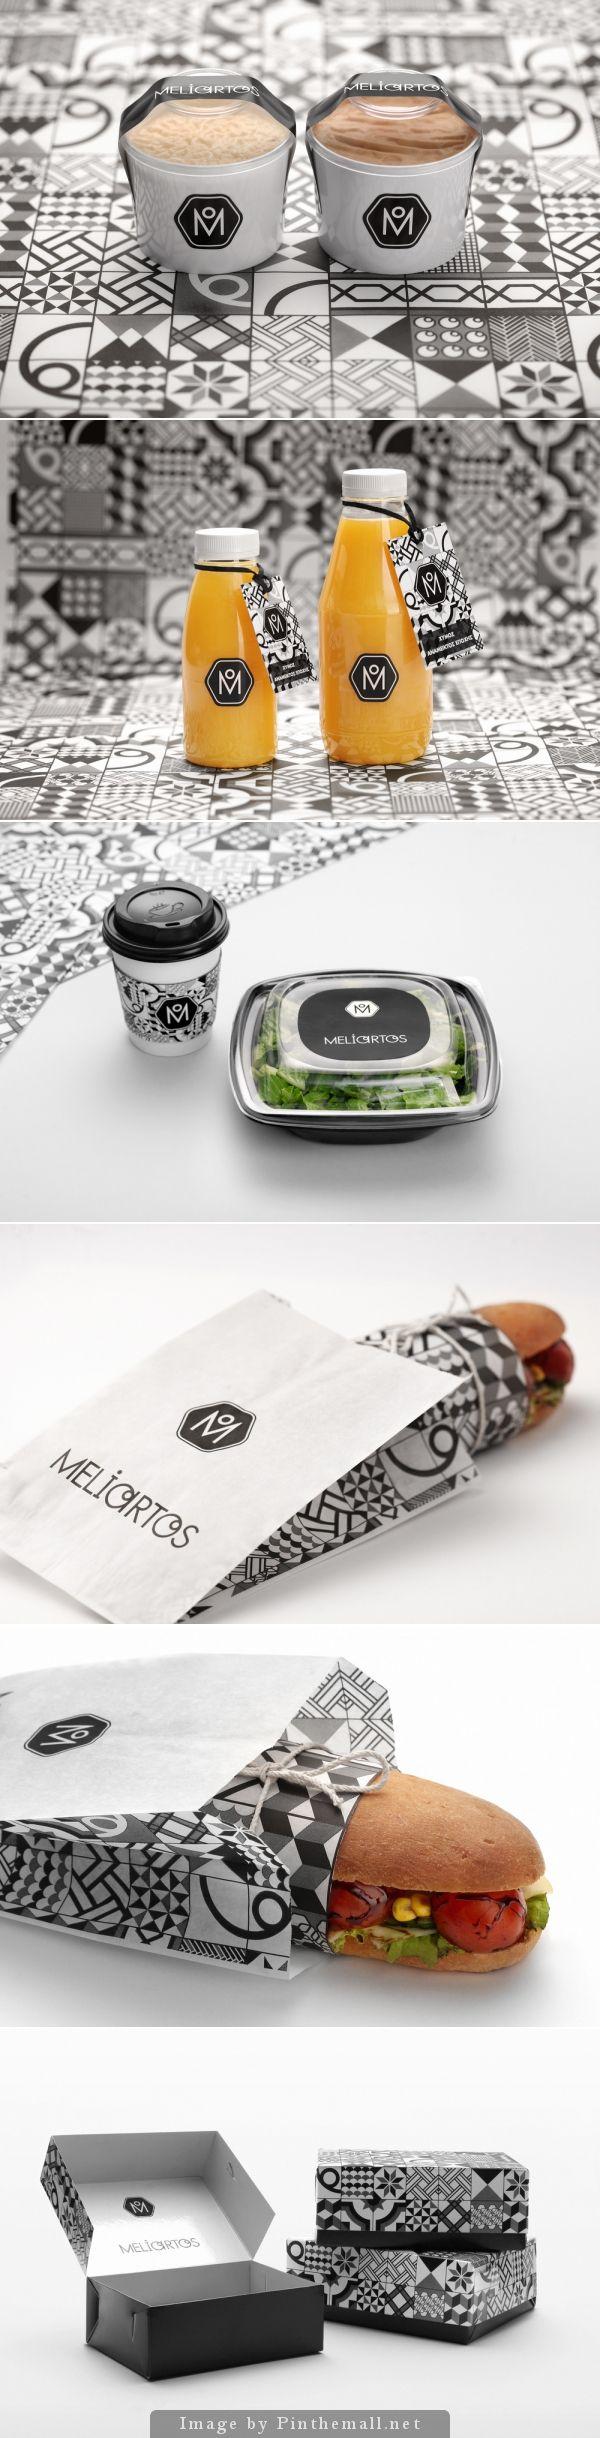 package / Meliartos #kanella #greece #gd